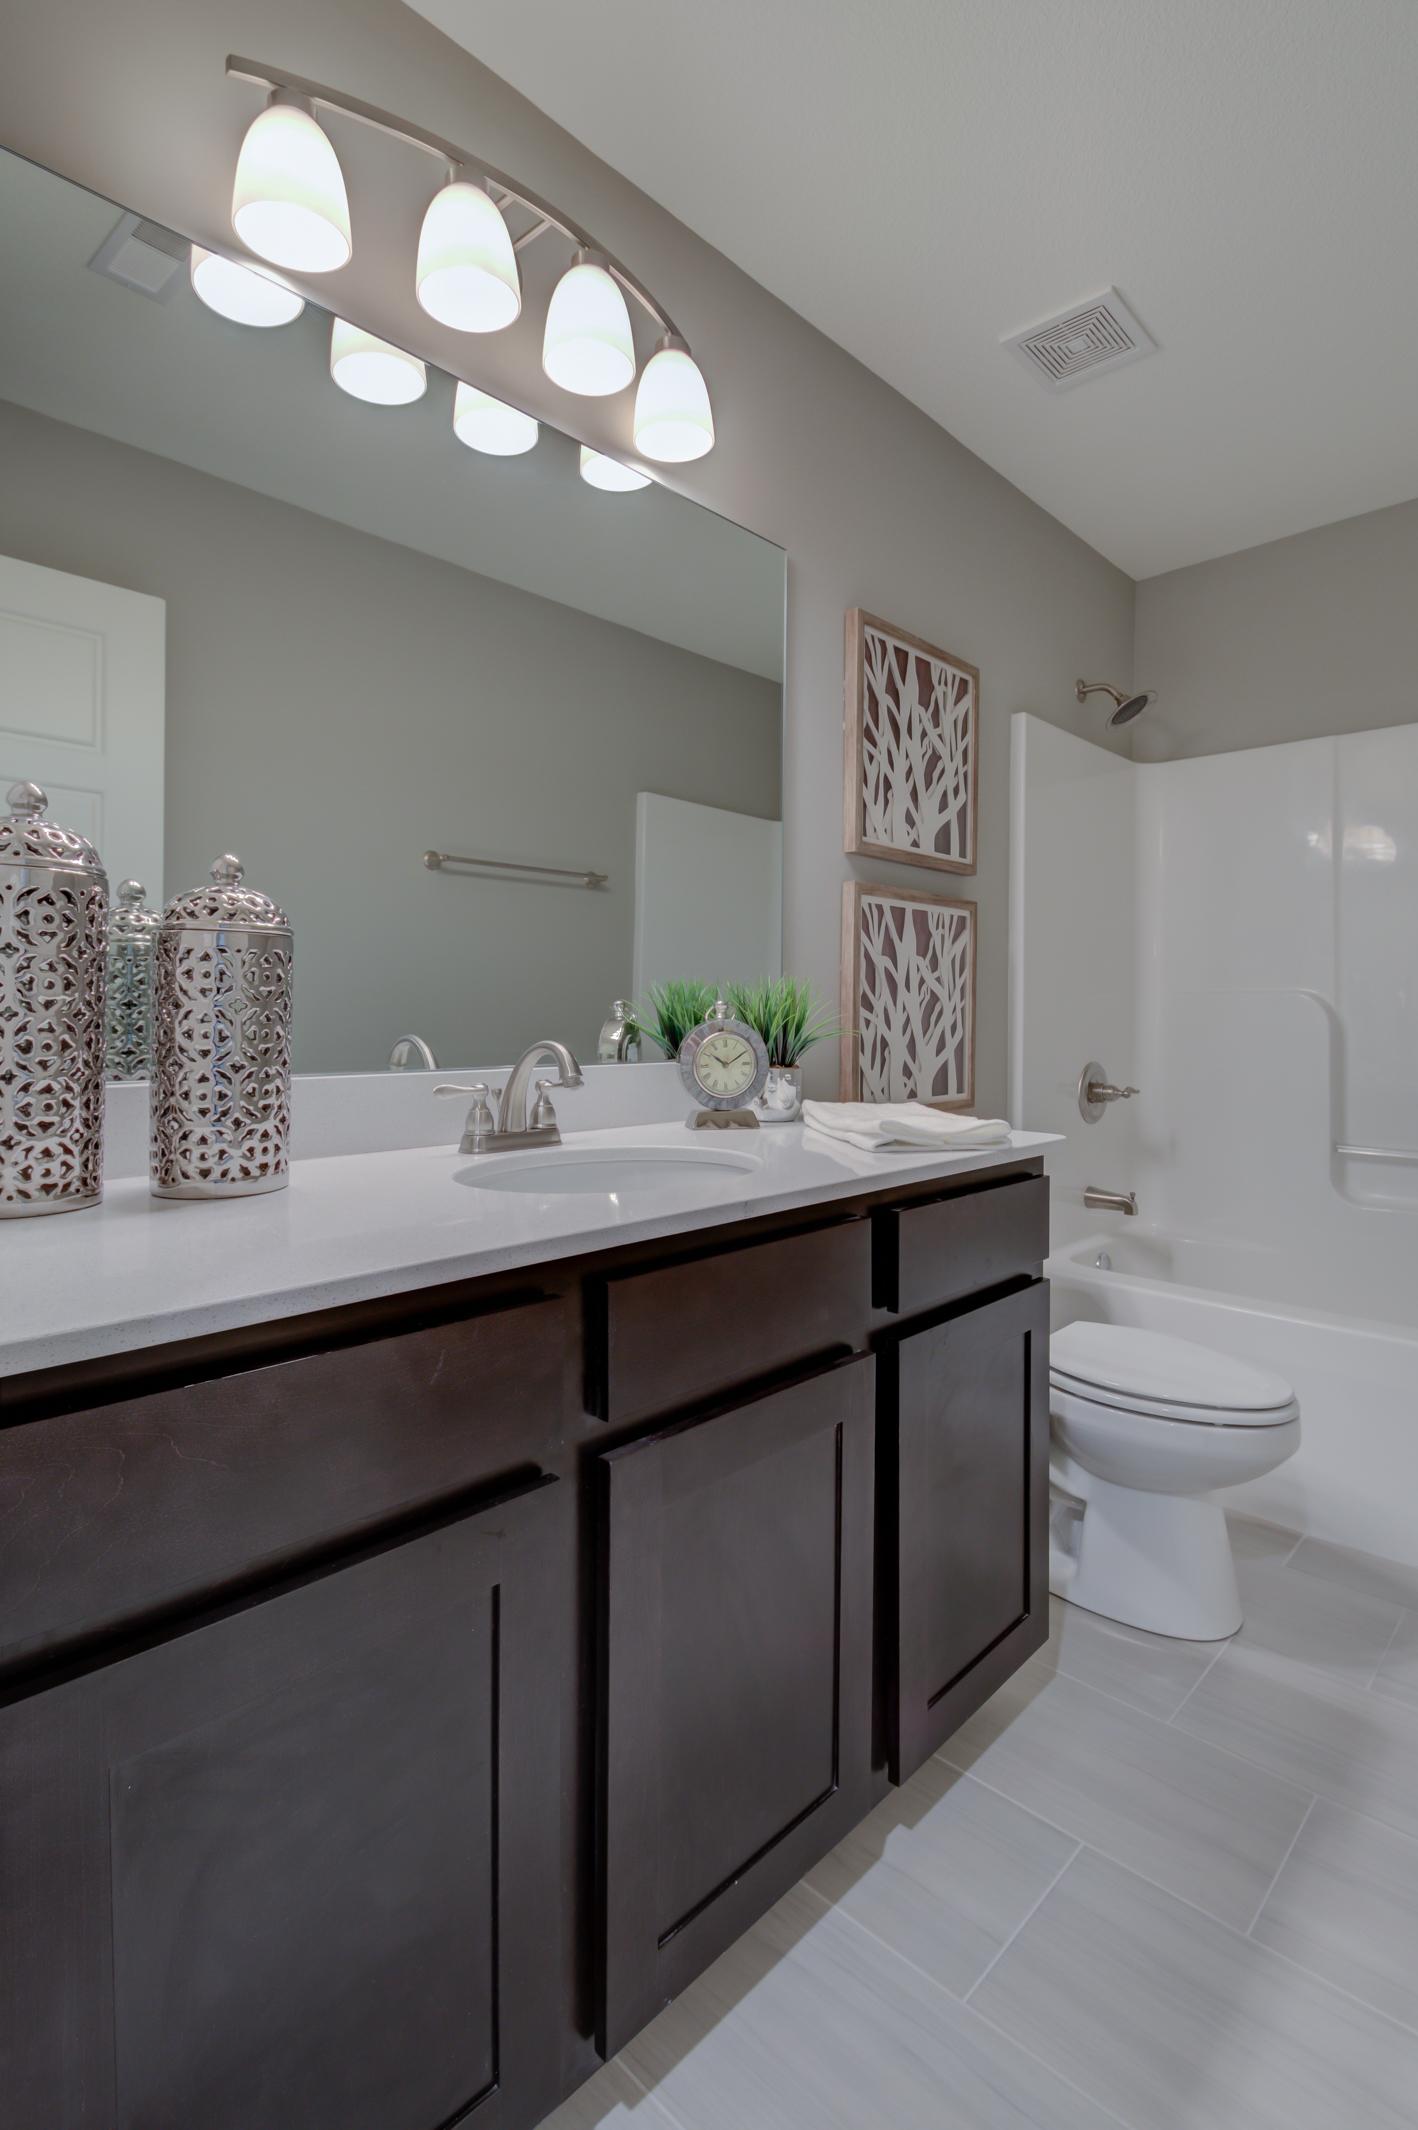 Secondary_Bathroom_Home_For_Sale.jpg